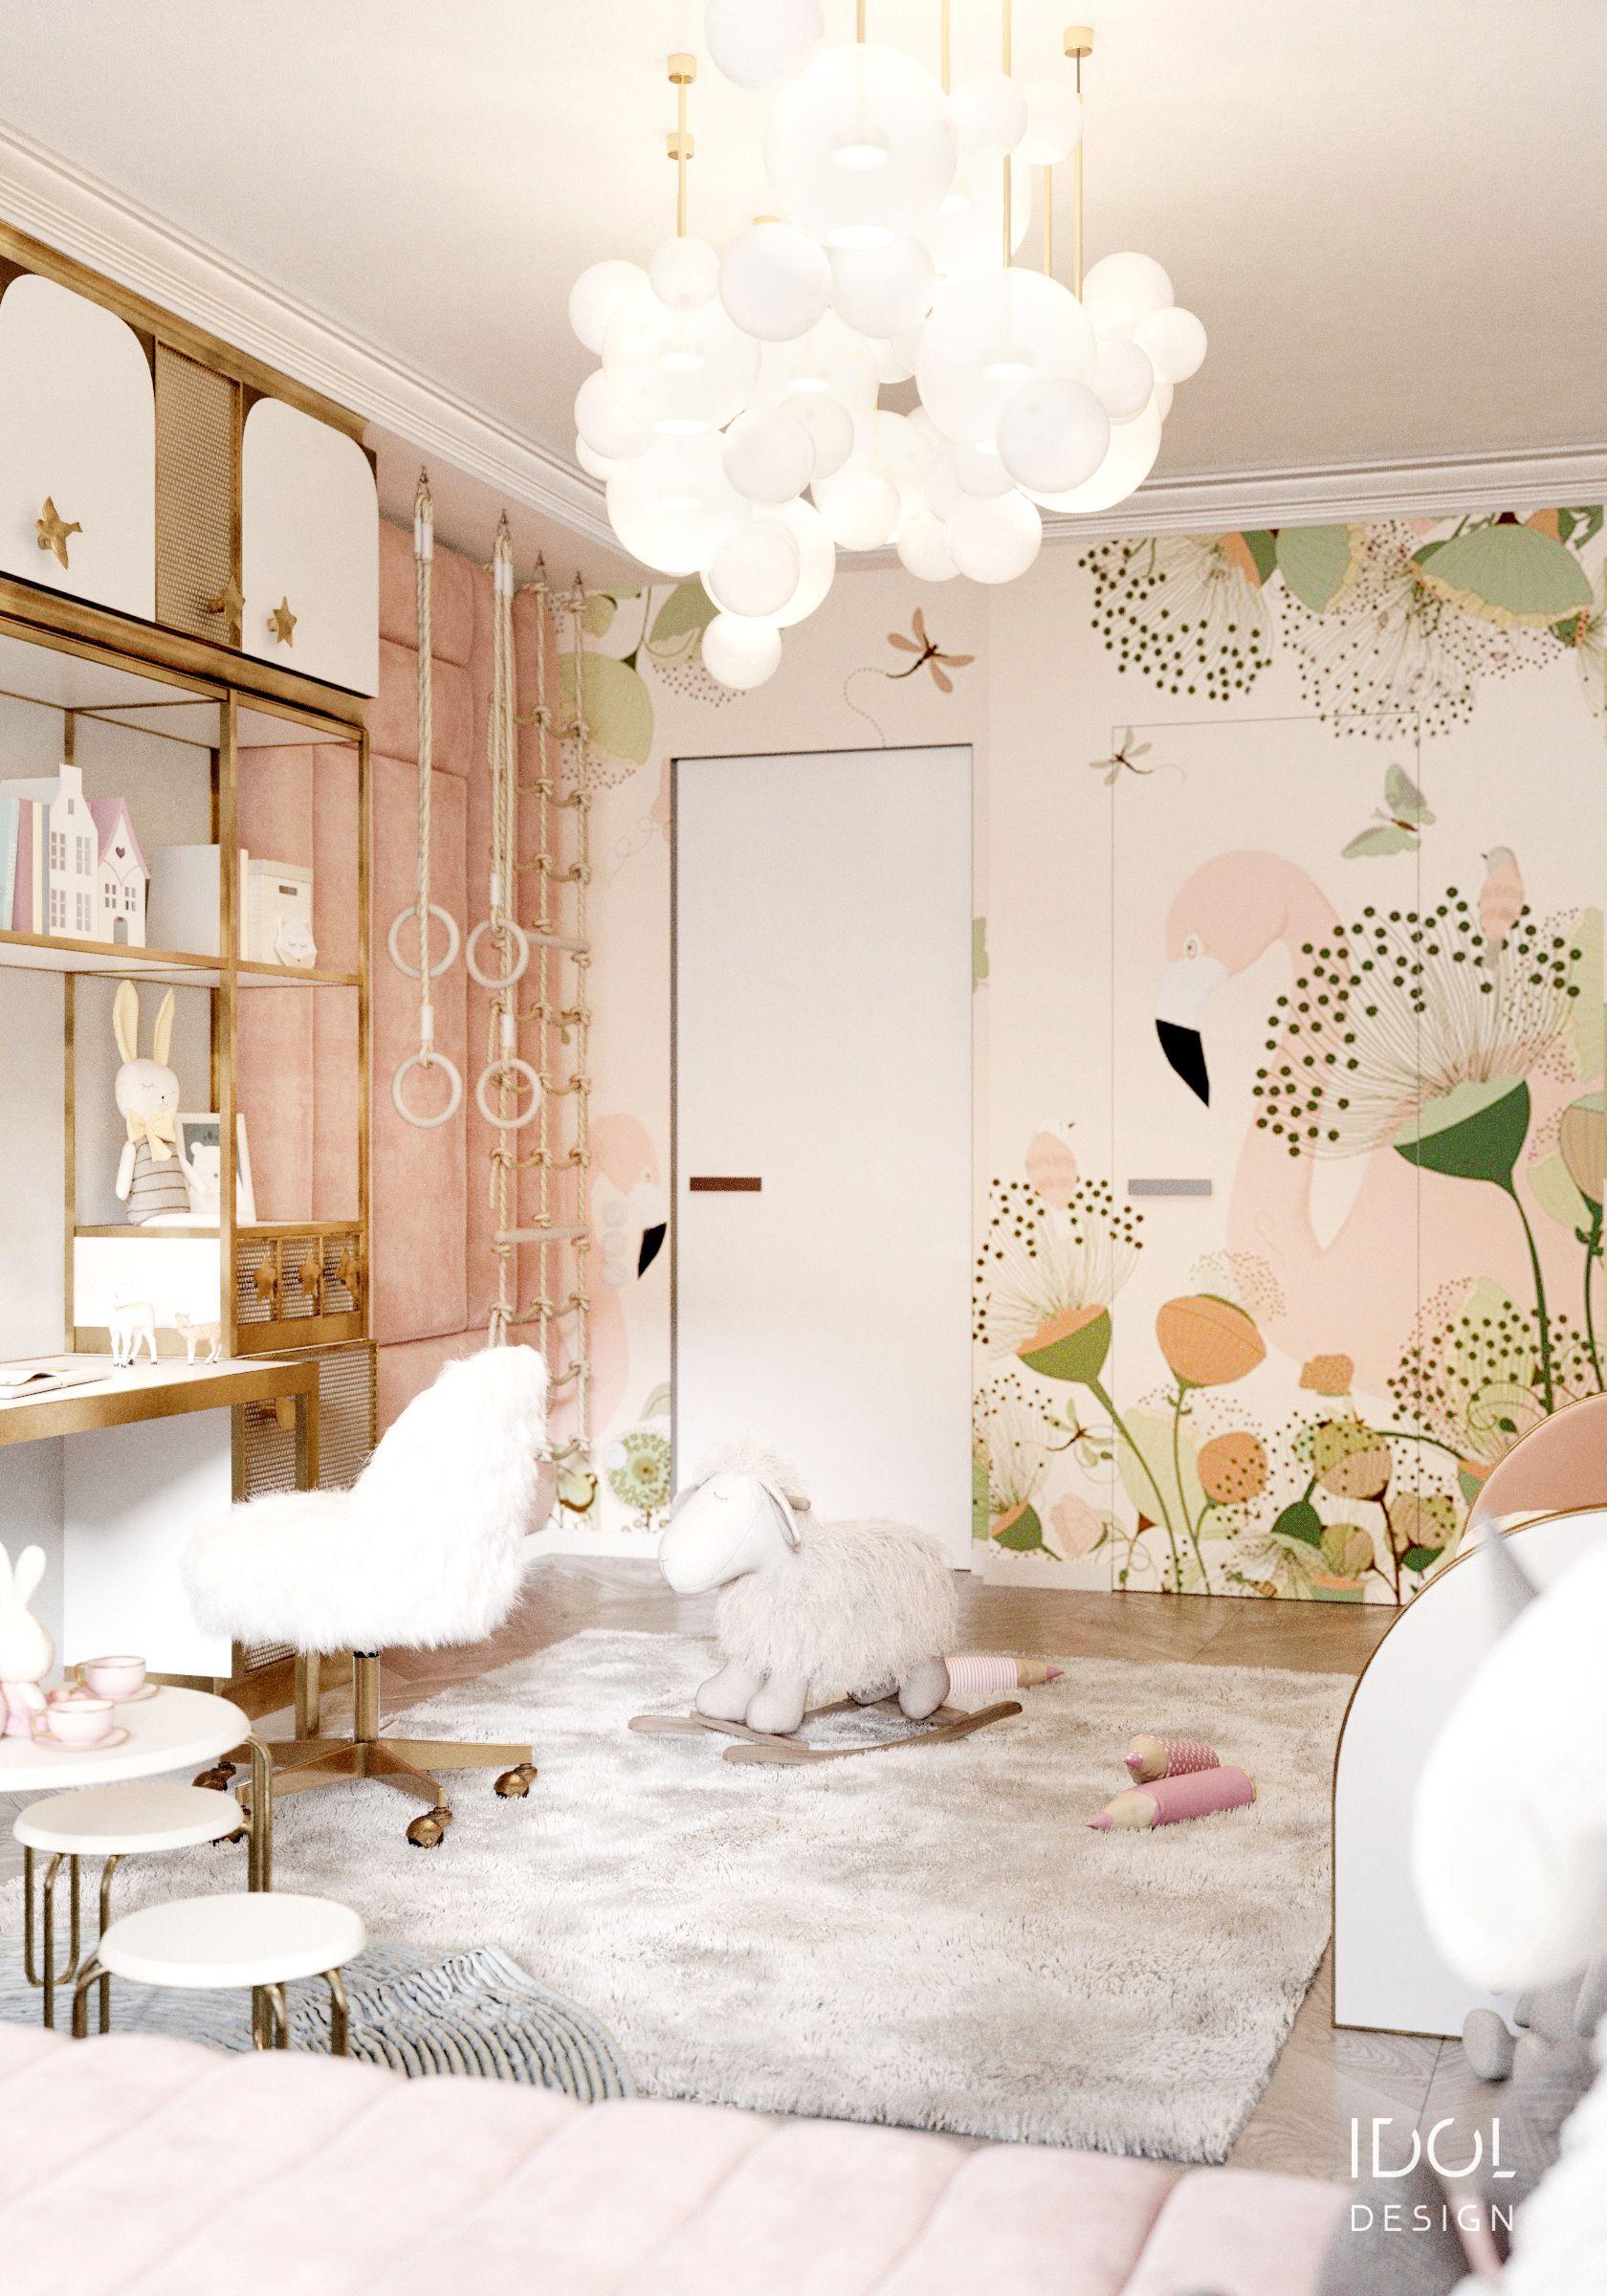 bedroom, wooden floor, wallpaper, golden table compact, white balloons pendants, white round table,